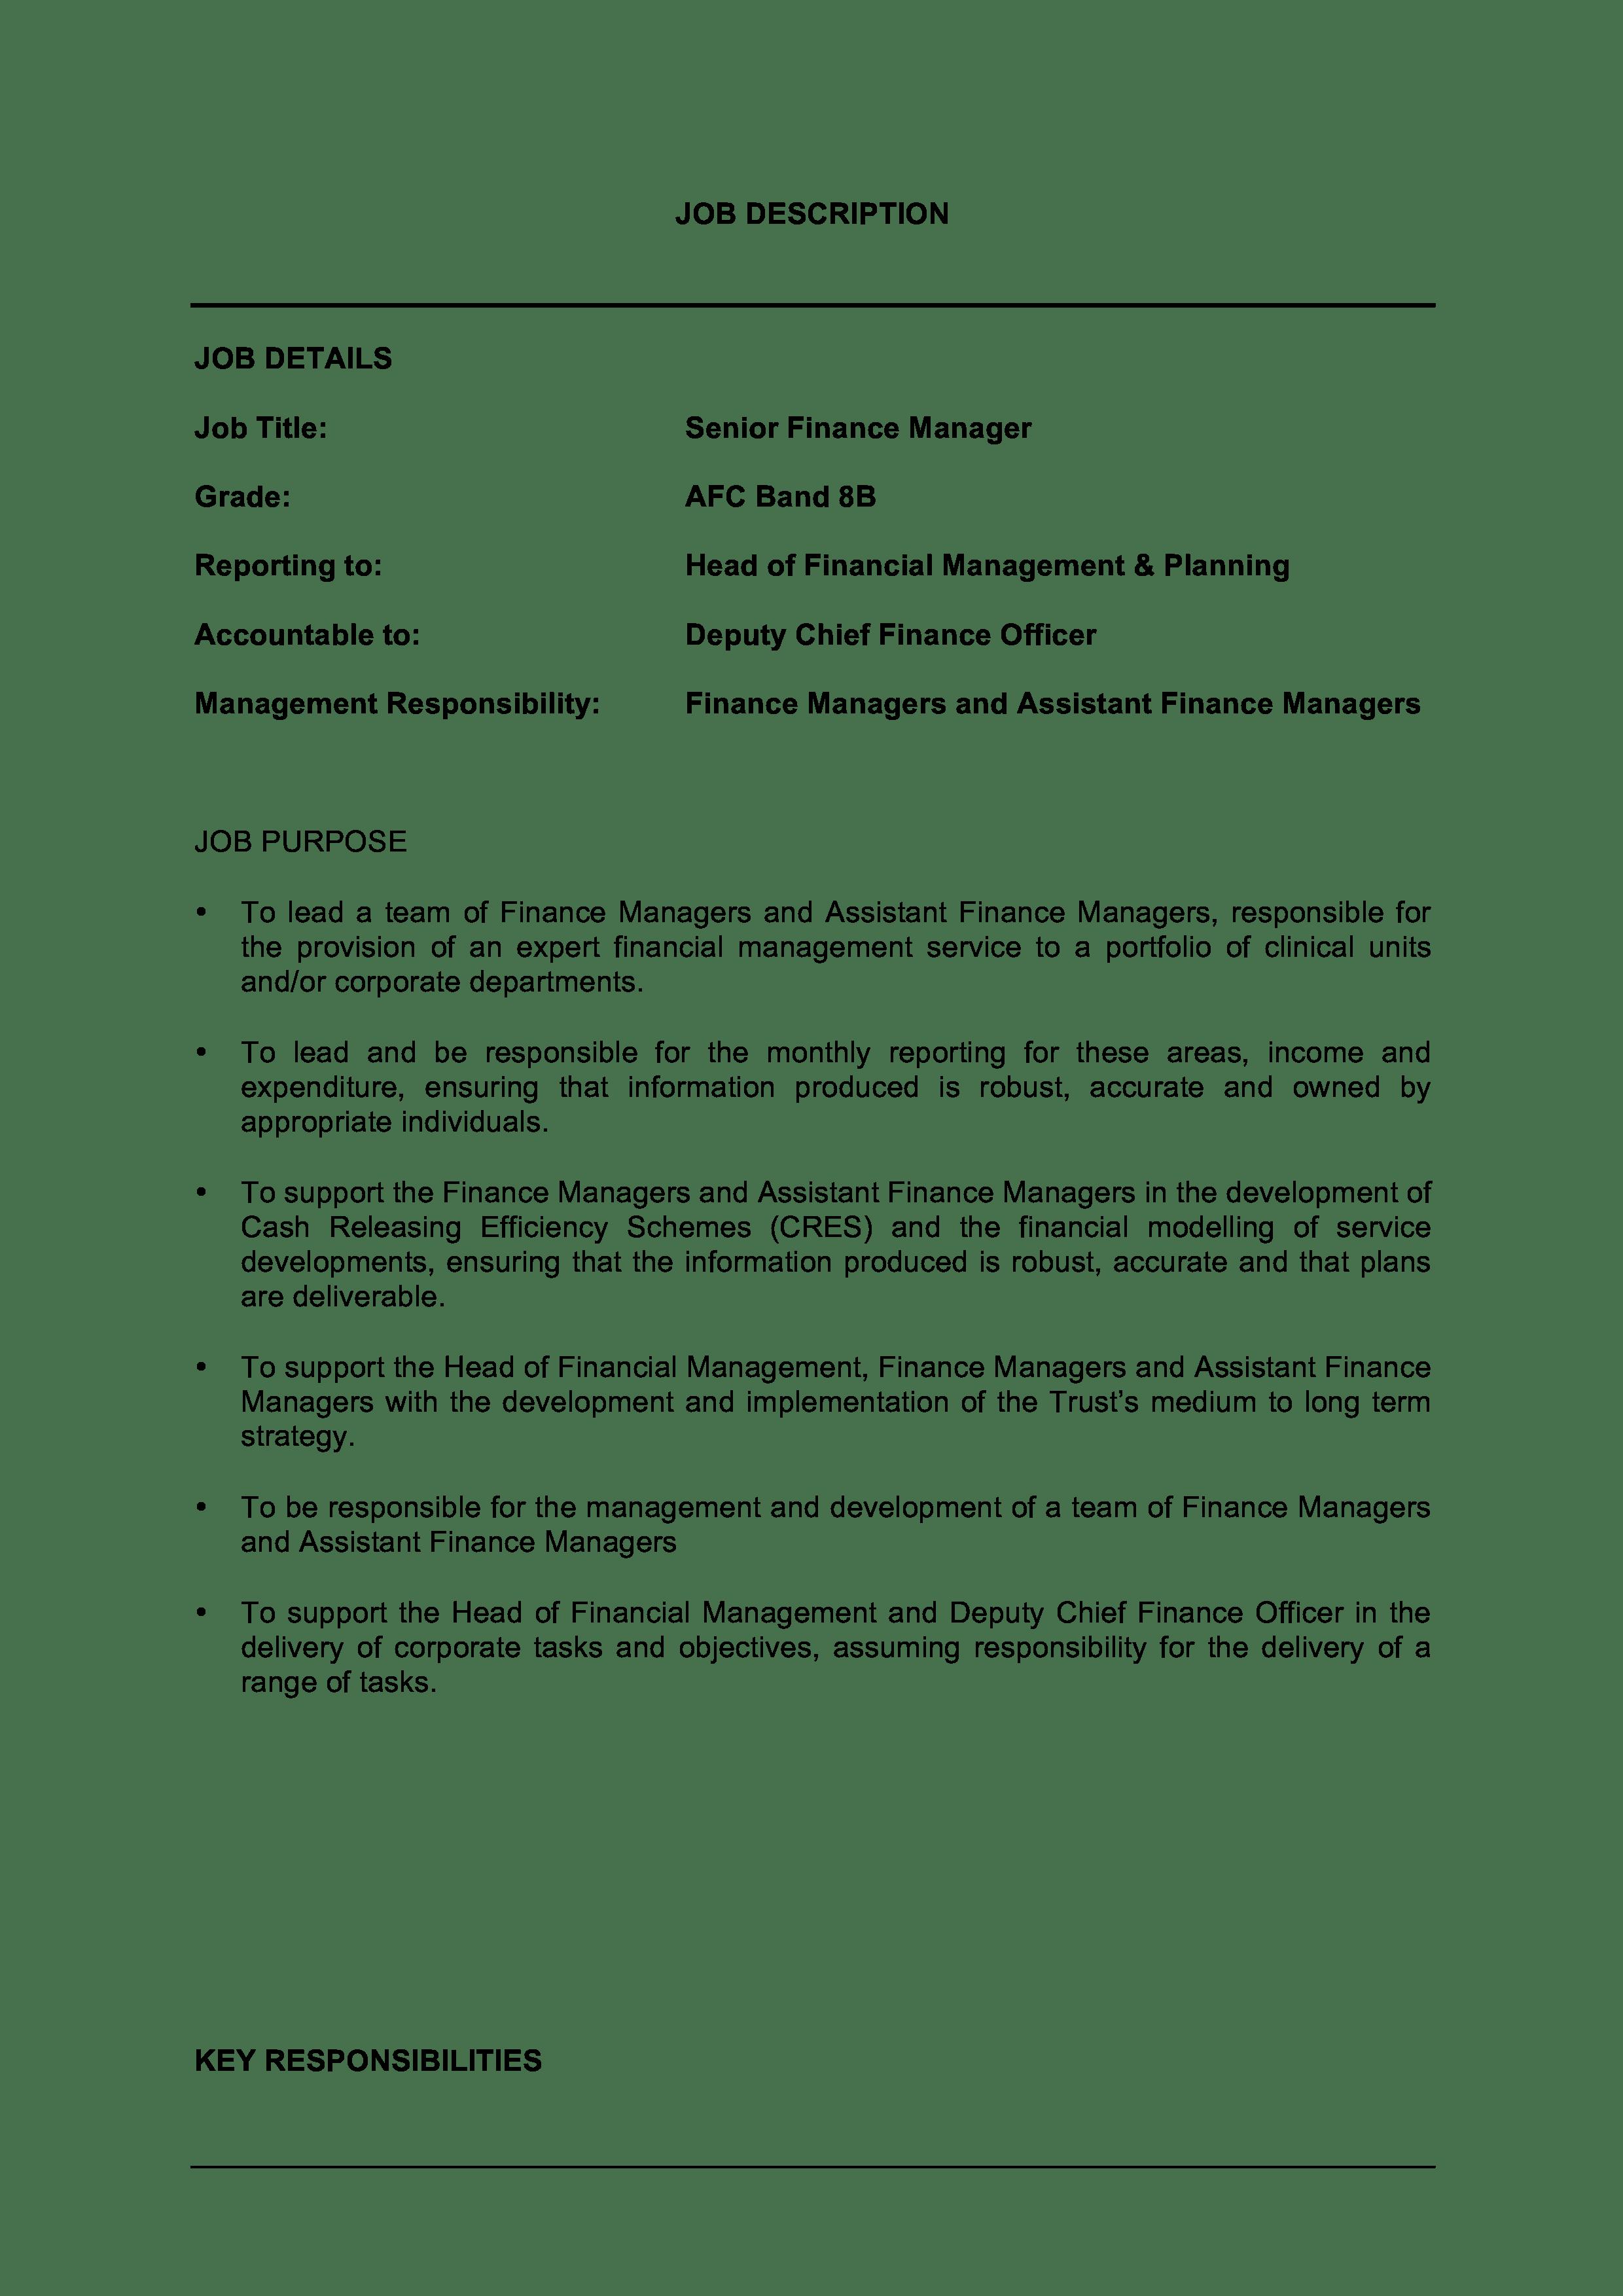 financial-manager-job-responsibilities-3